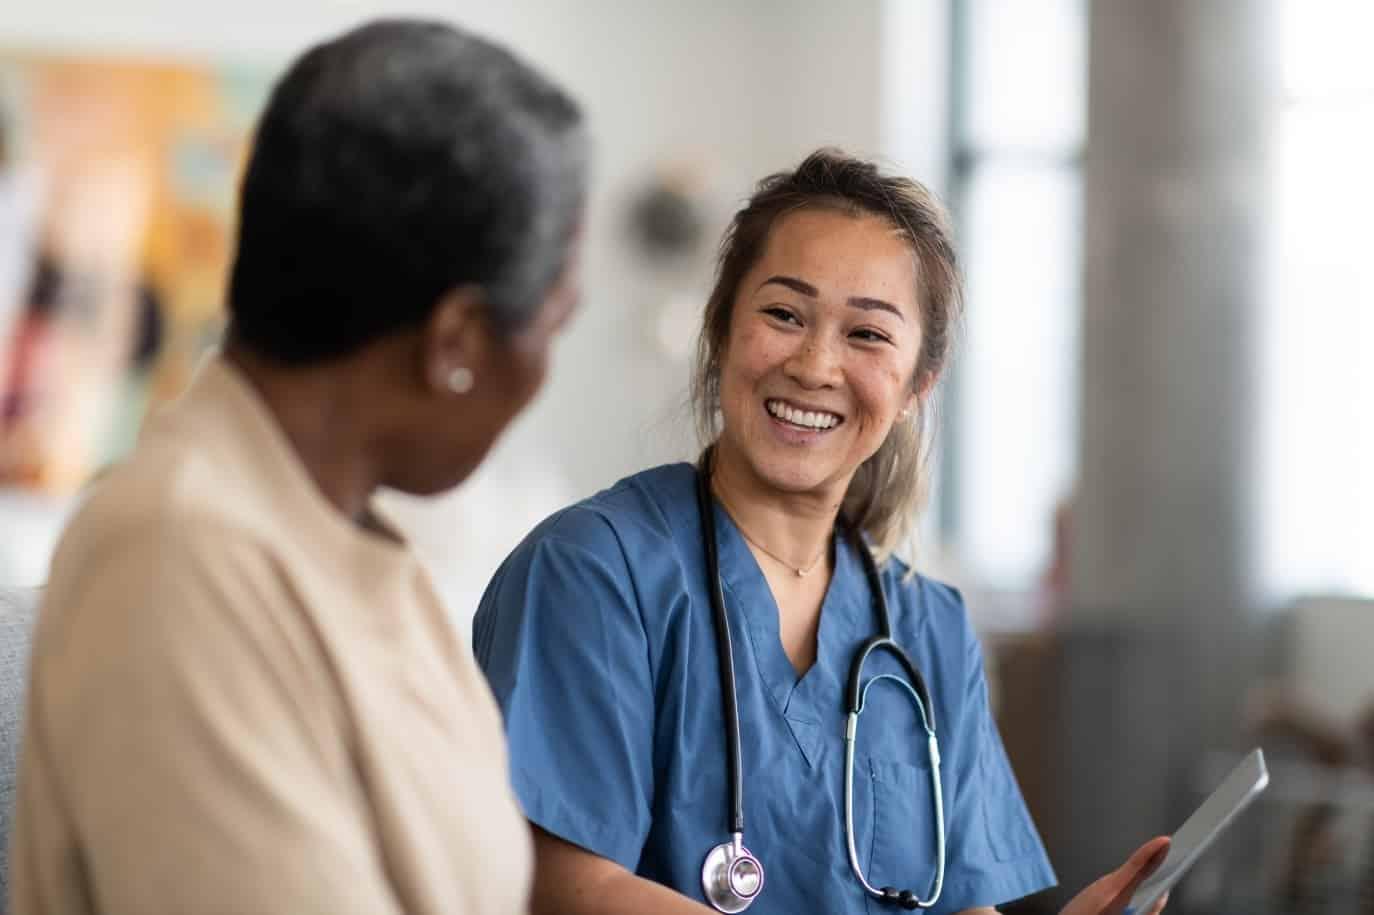 Smiling nurse talks with breast cancer patient, reviews survivorsip care plan